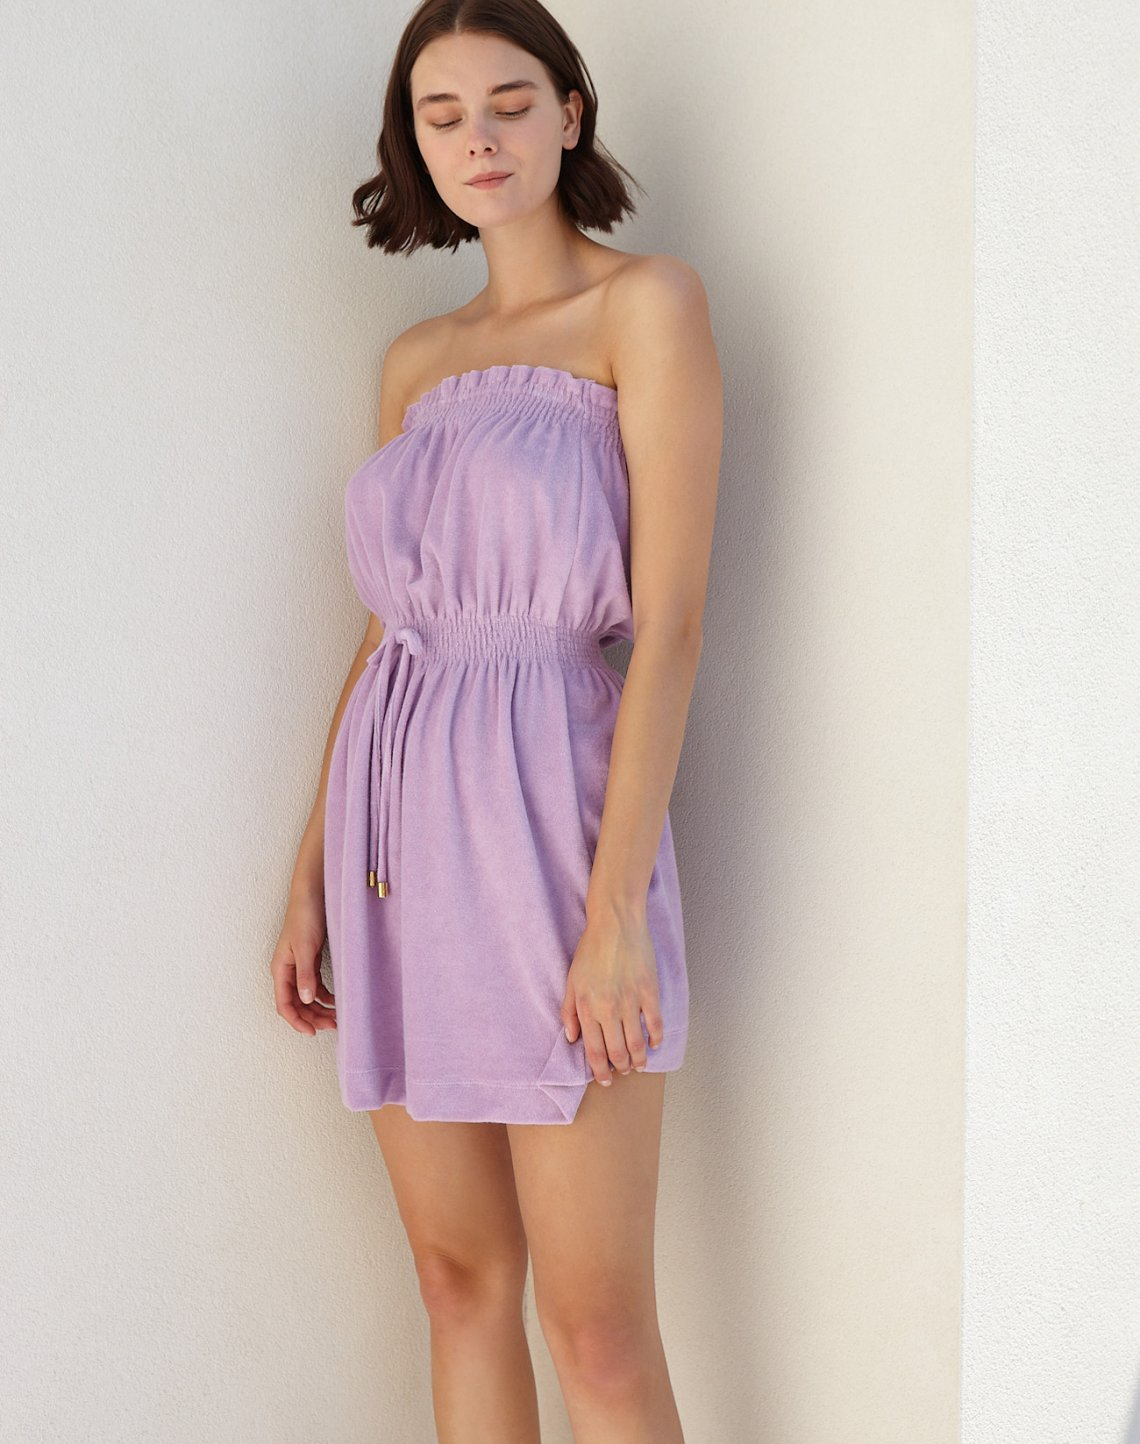 Strapless towel dress